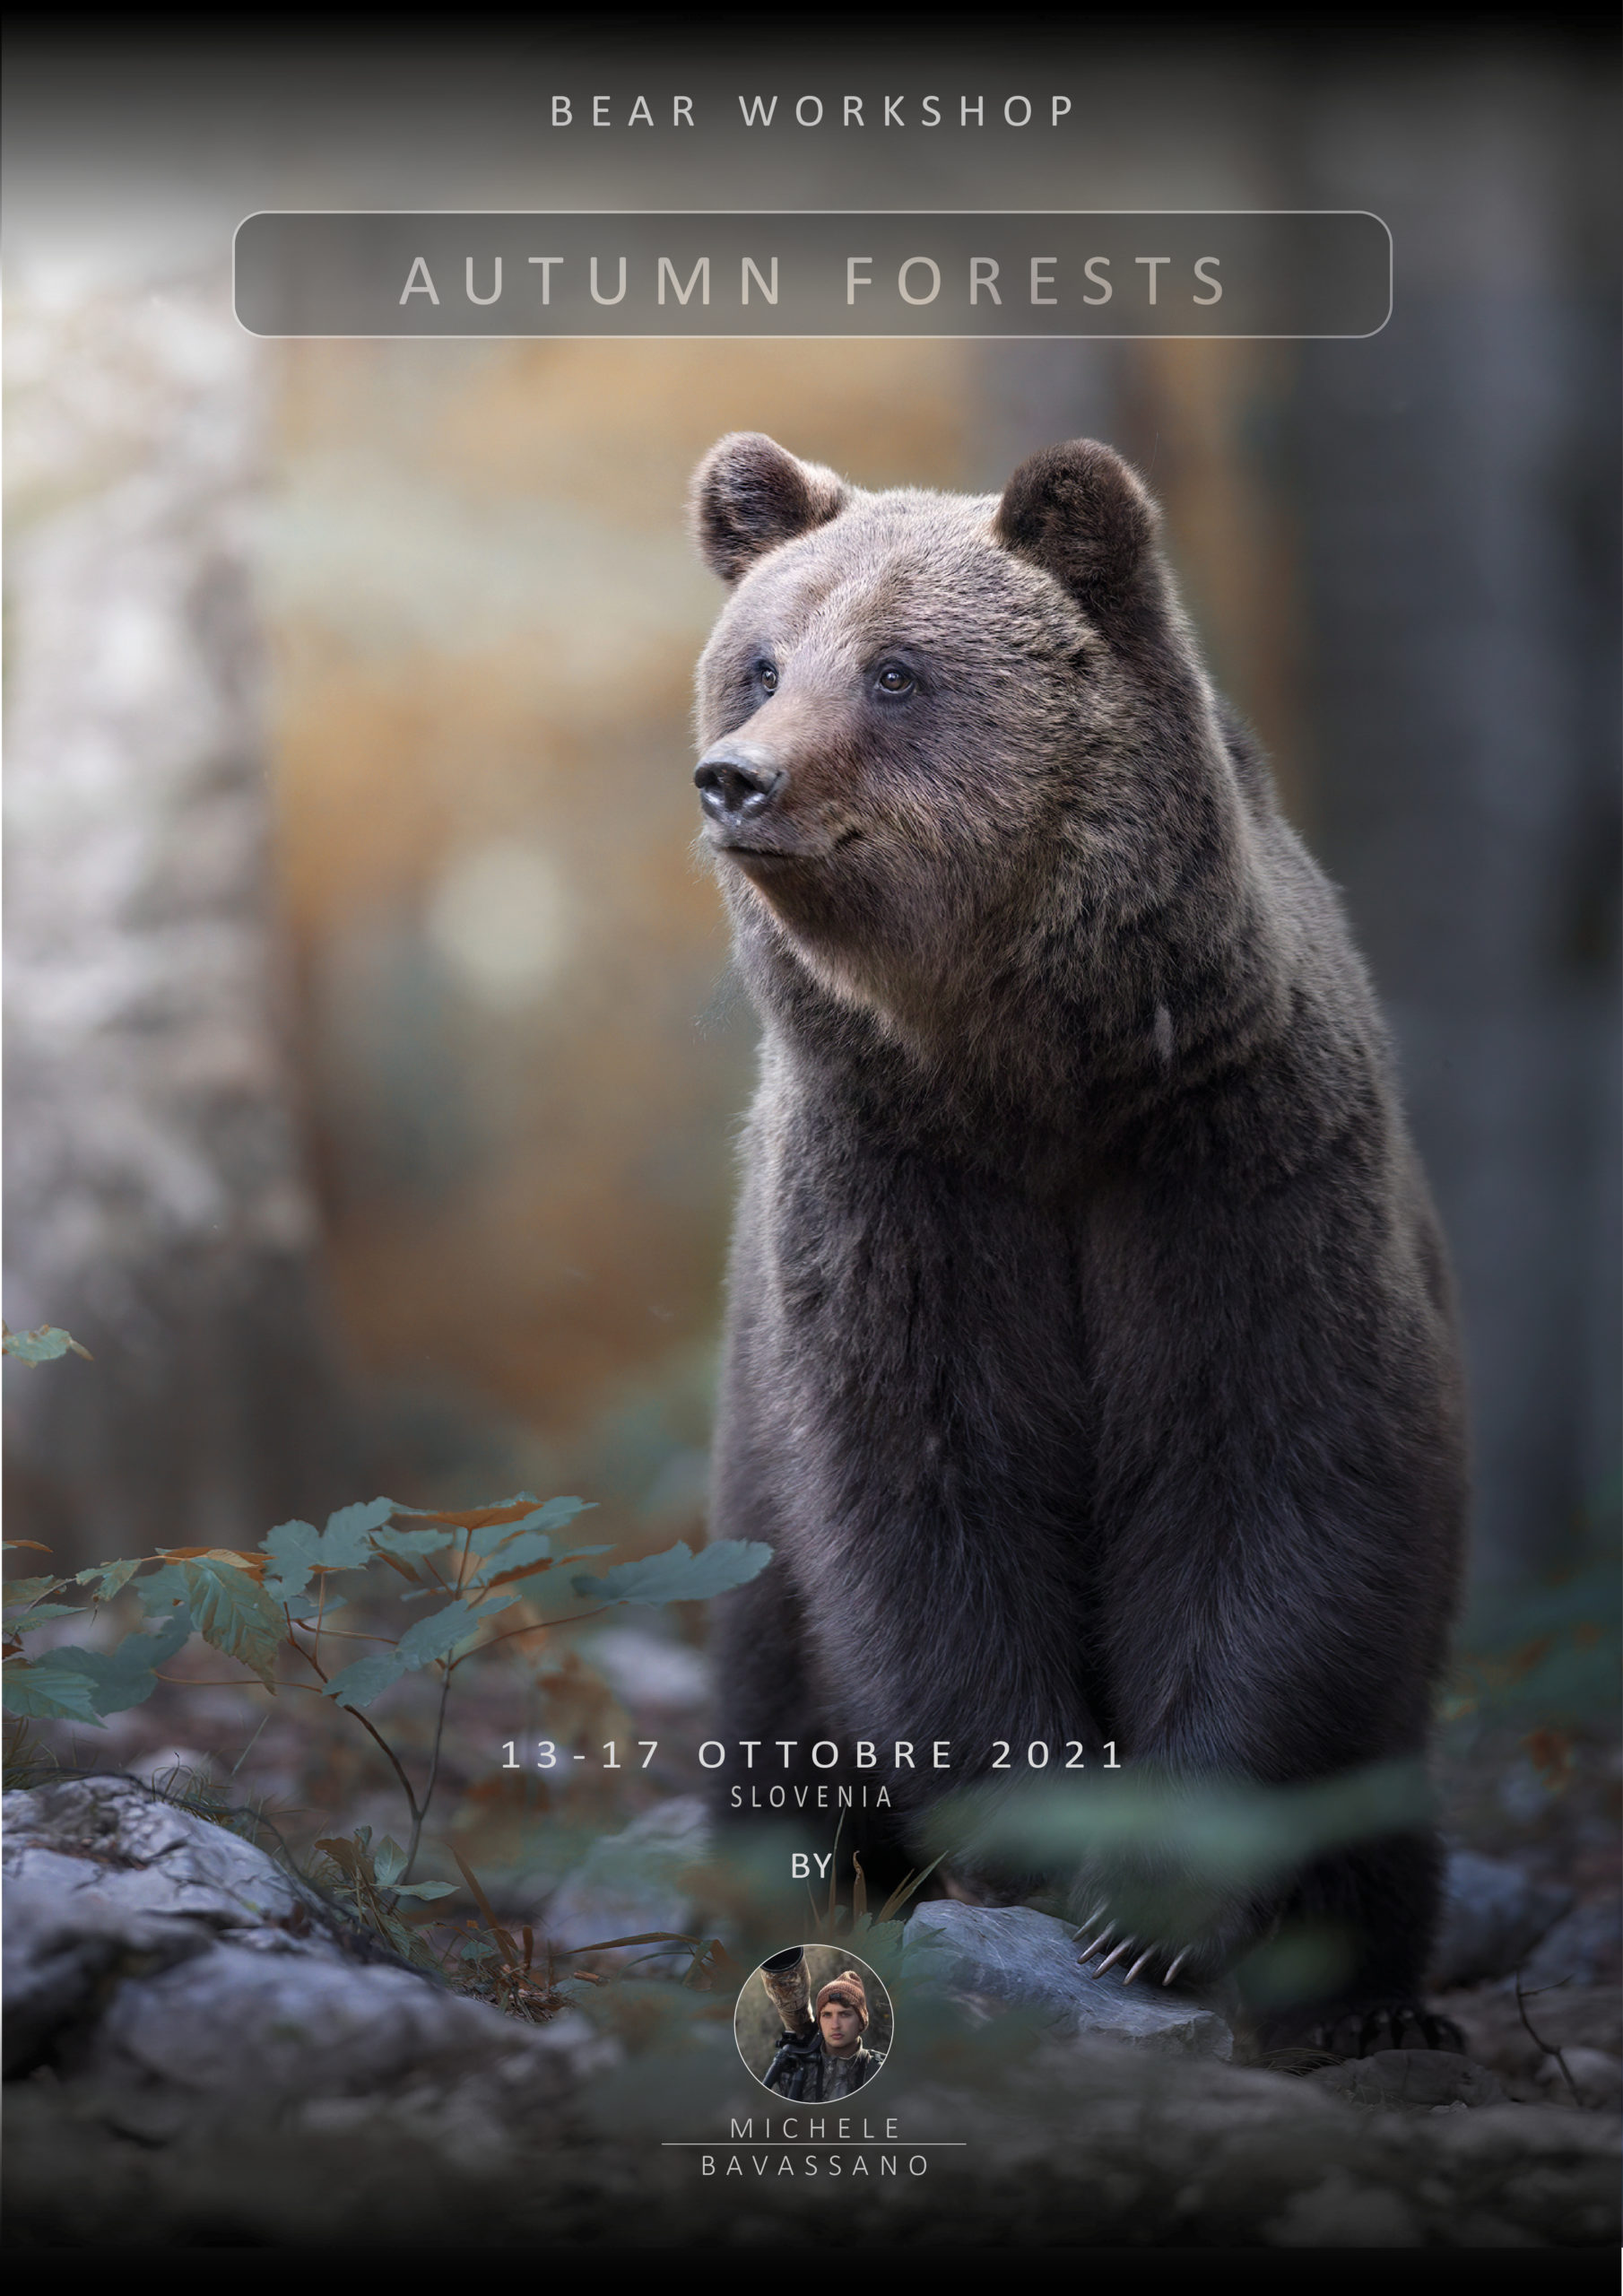 workshop bear photo tour